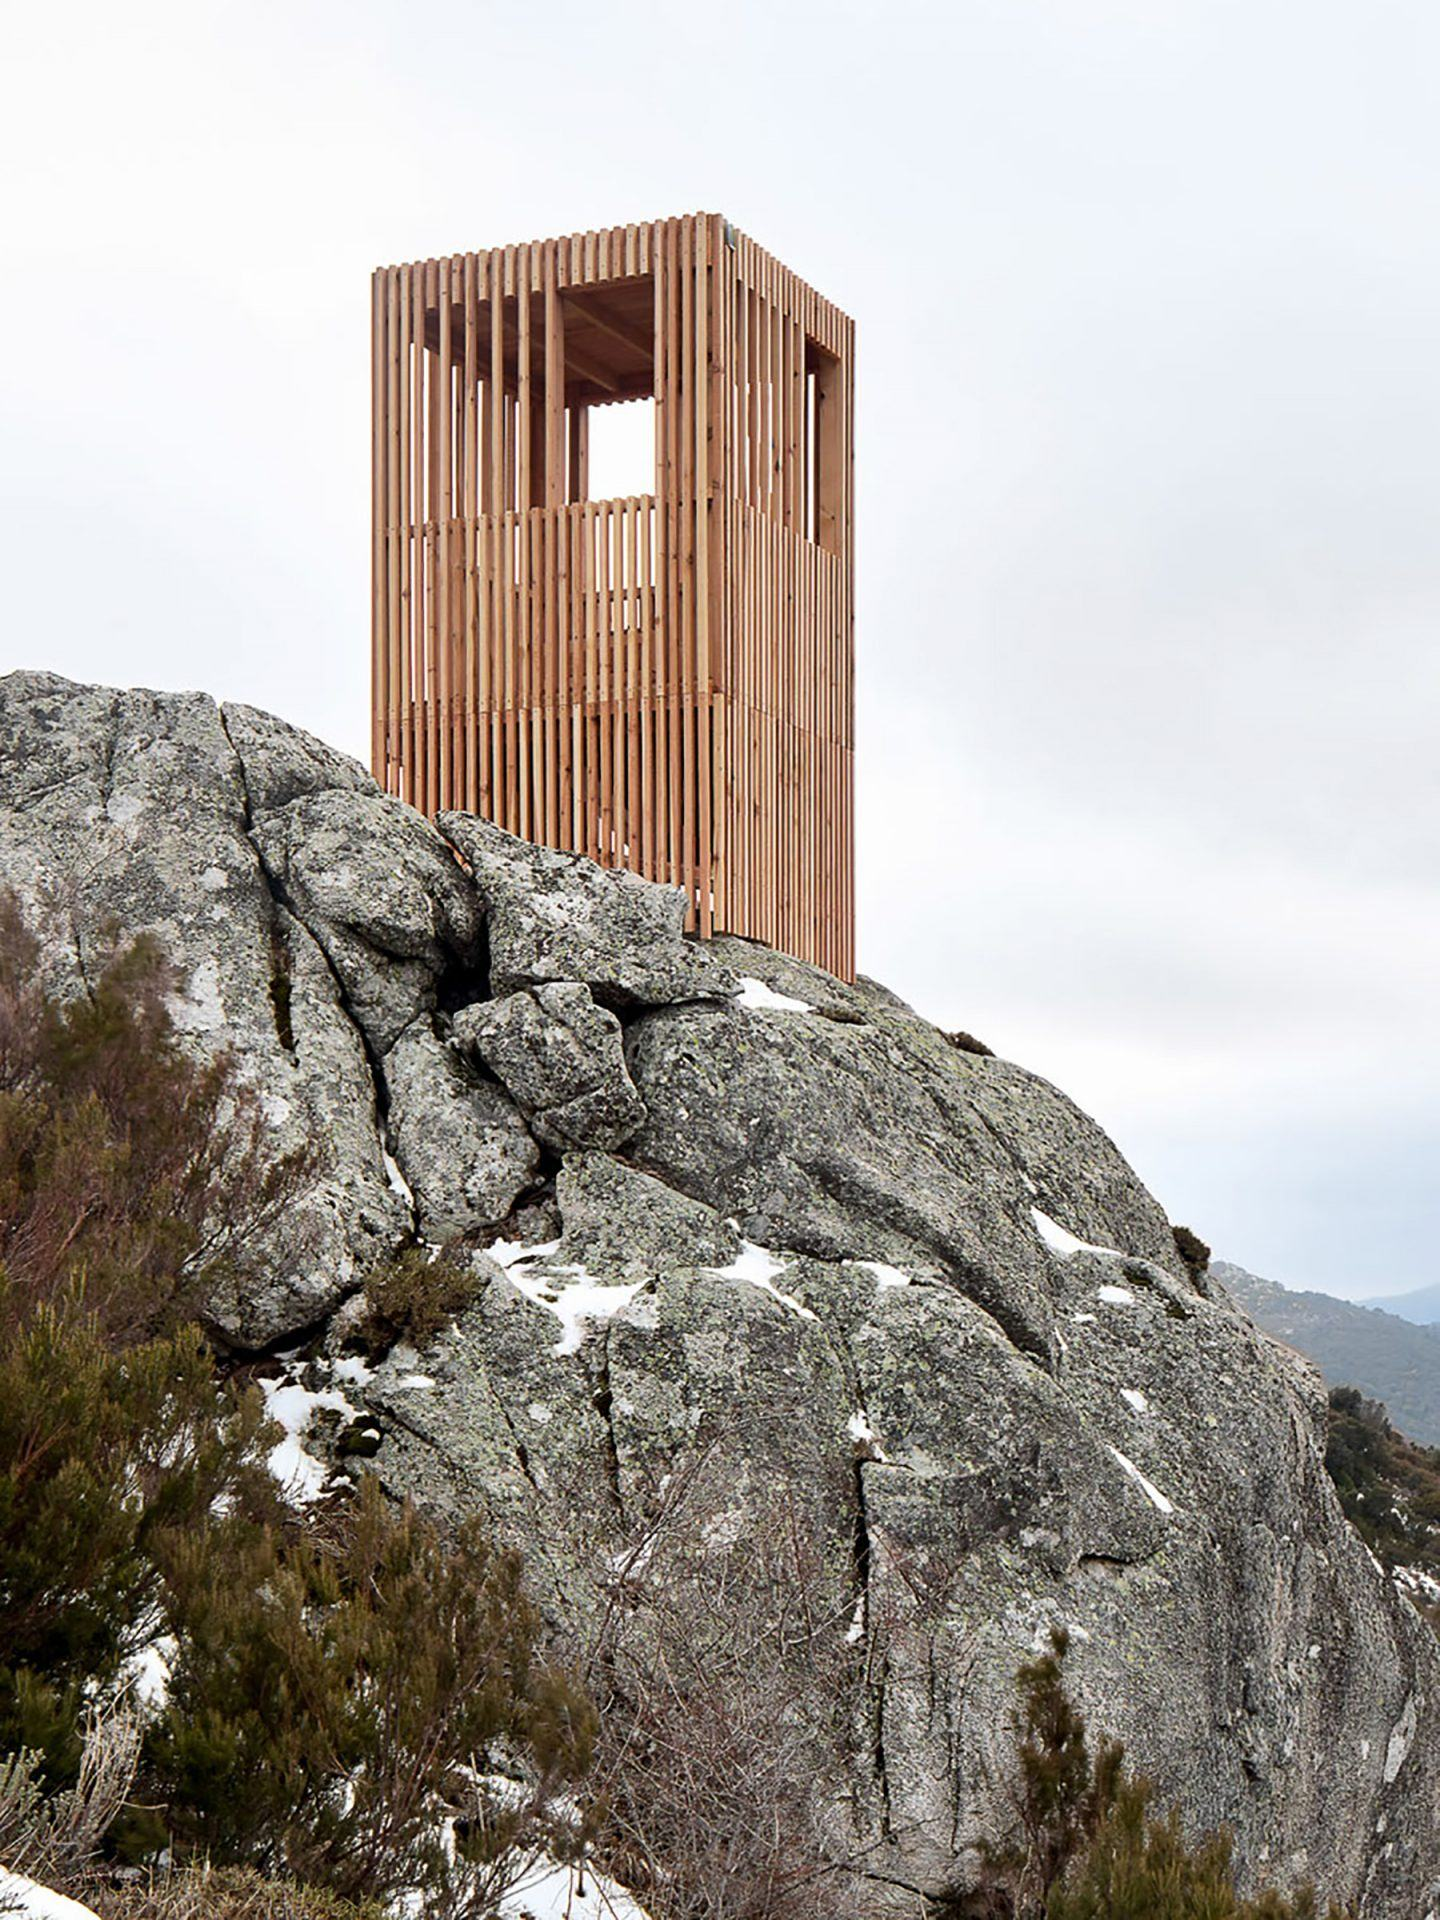 IGNANT-Architecture-Orma-Observatoire-Du-Cerf-Corse-3